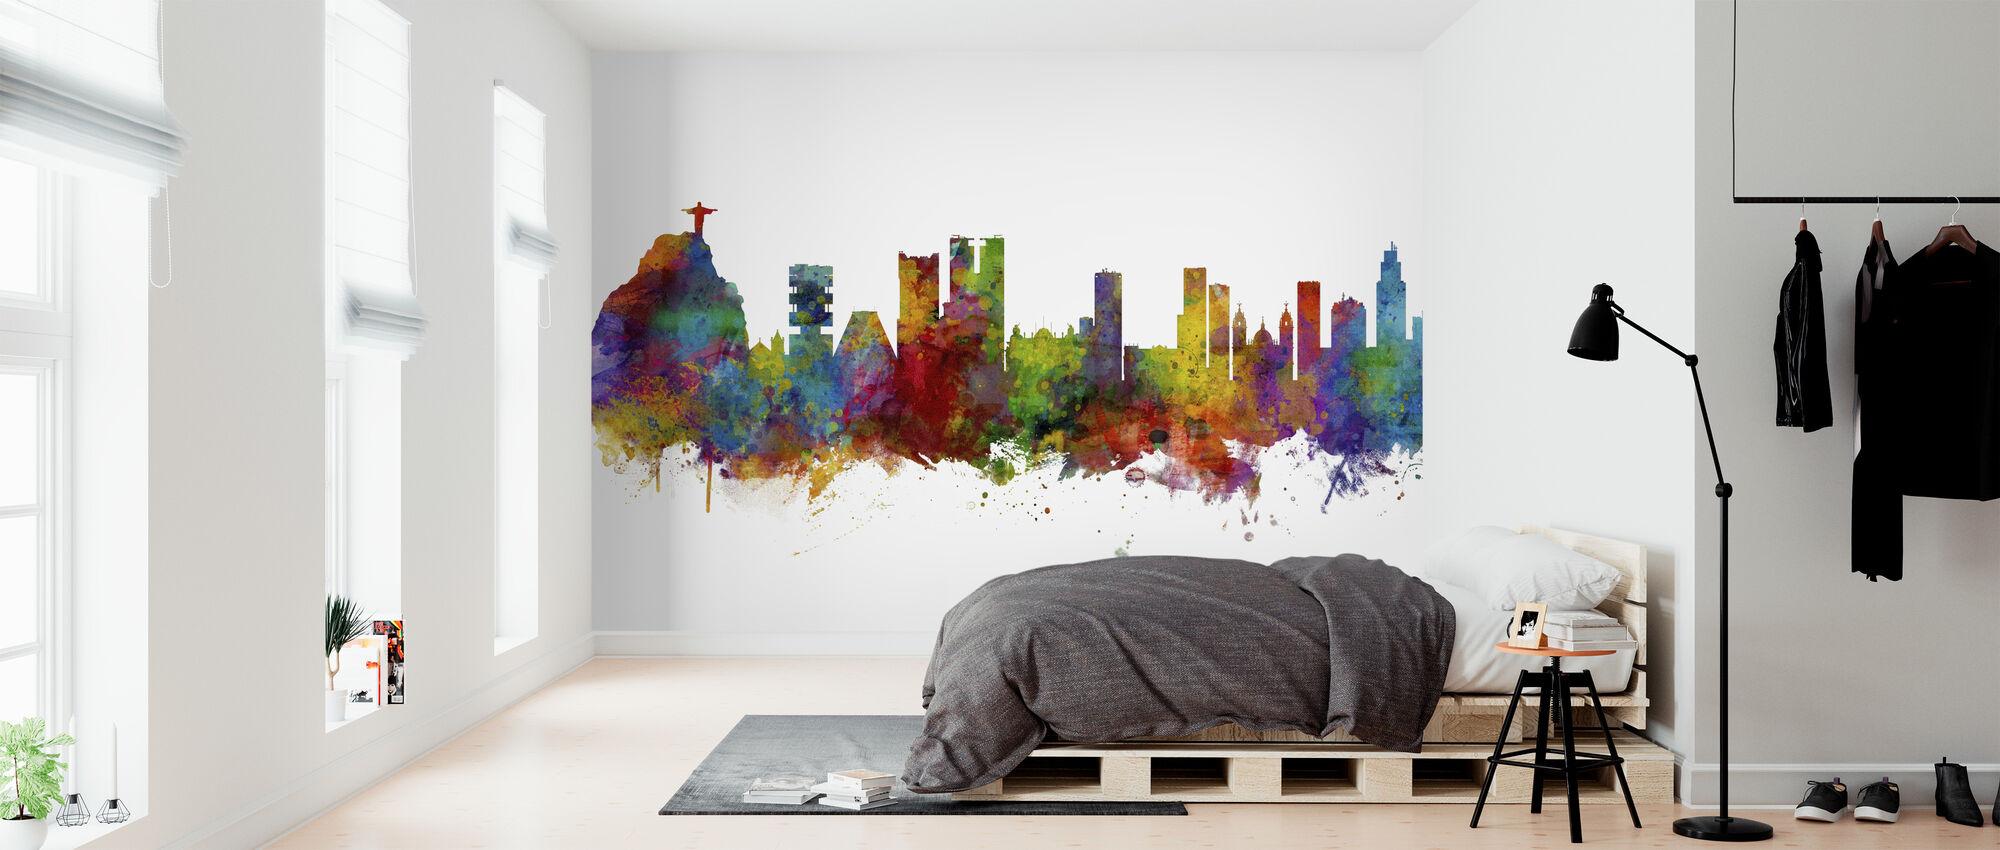 Rio de Janeiro Skyline Brazil - Wallpaper - Bedroom